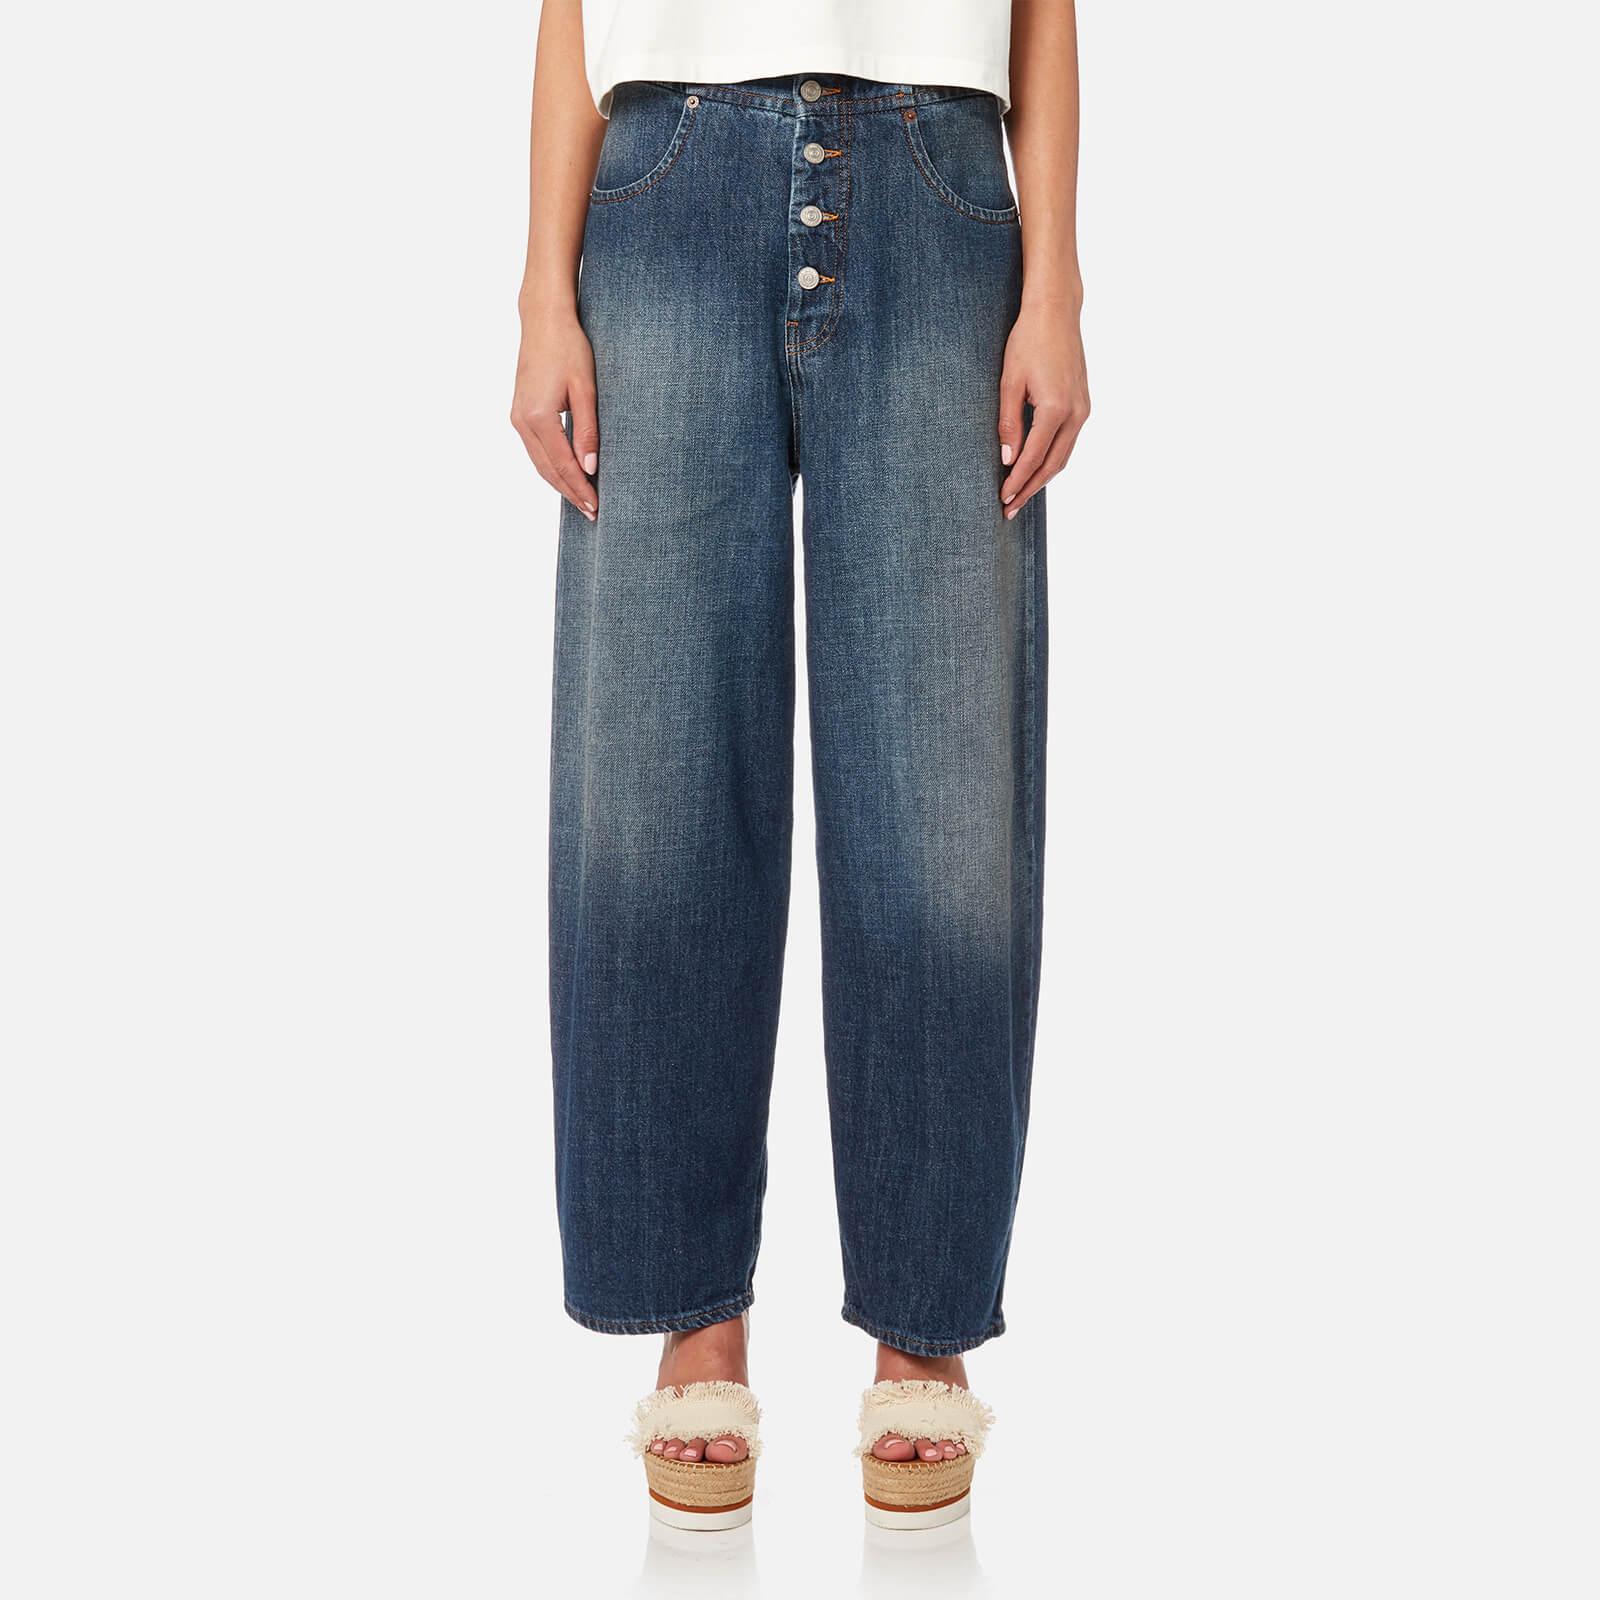 MM6 Maison Margiela Women's Button Fly Jeans - Medium Blue